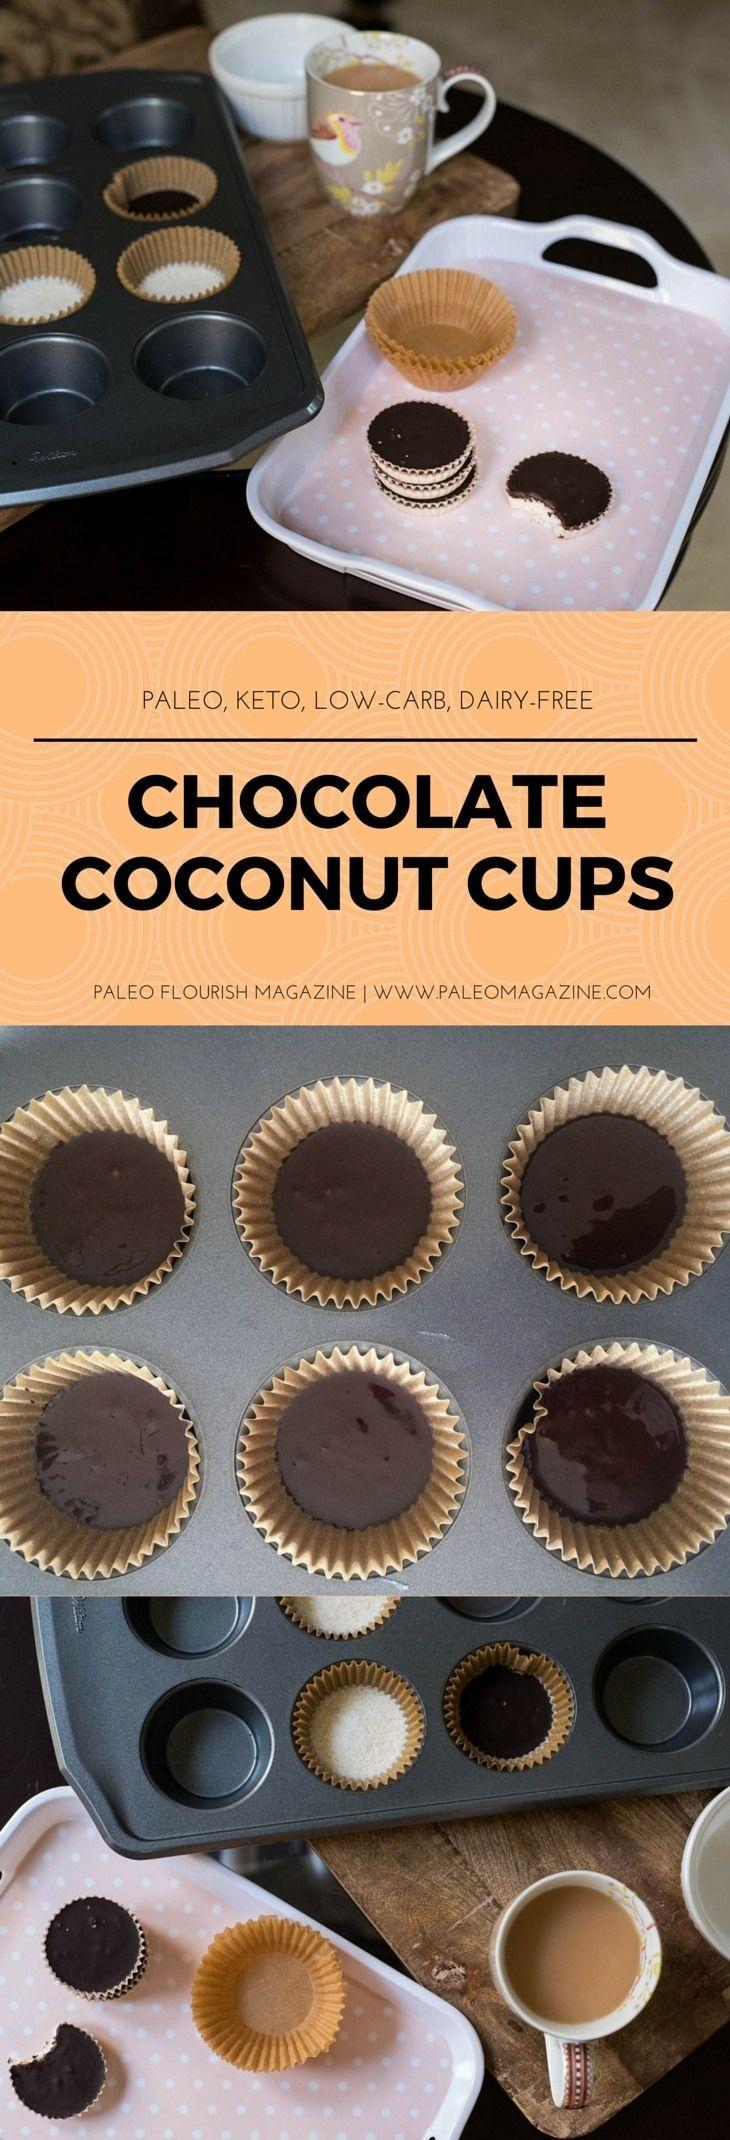 Chocolate Coconut Cups Recipe [Paleo, Keto, Low-Carb, Dairy-Free] #paleo #recipes #glutenfree http://paleomagazine.com/chocolate-coconut-cups-recipe-paleo-keto-lowcarb-dairyfree